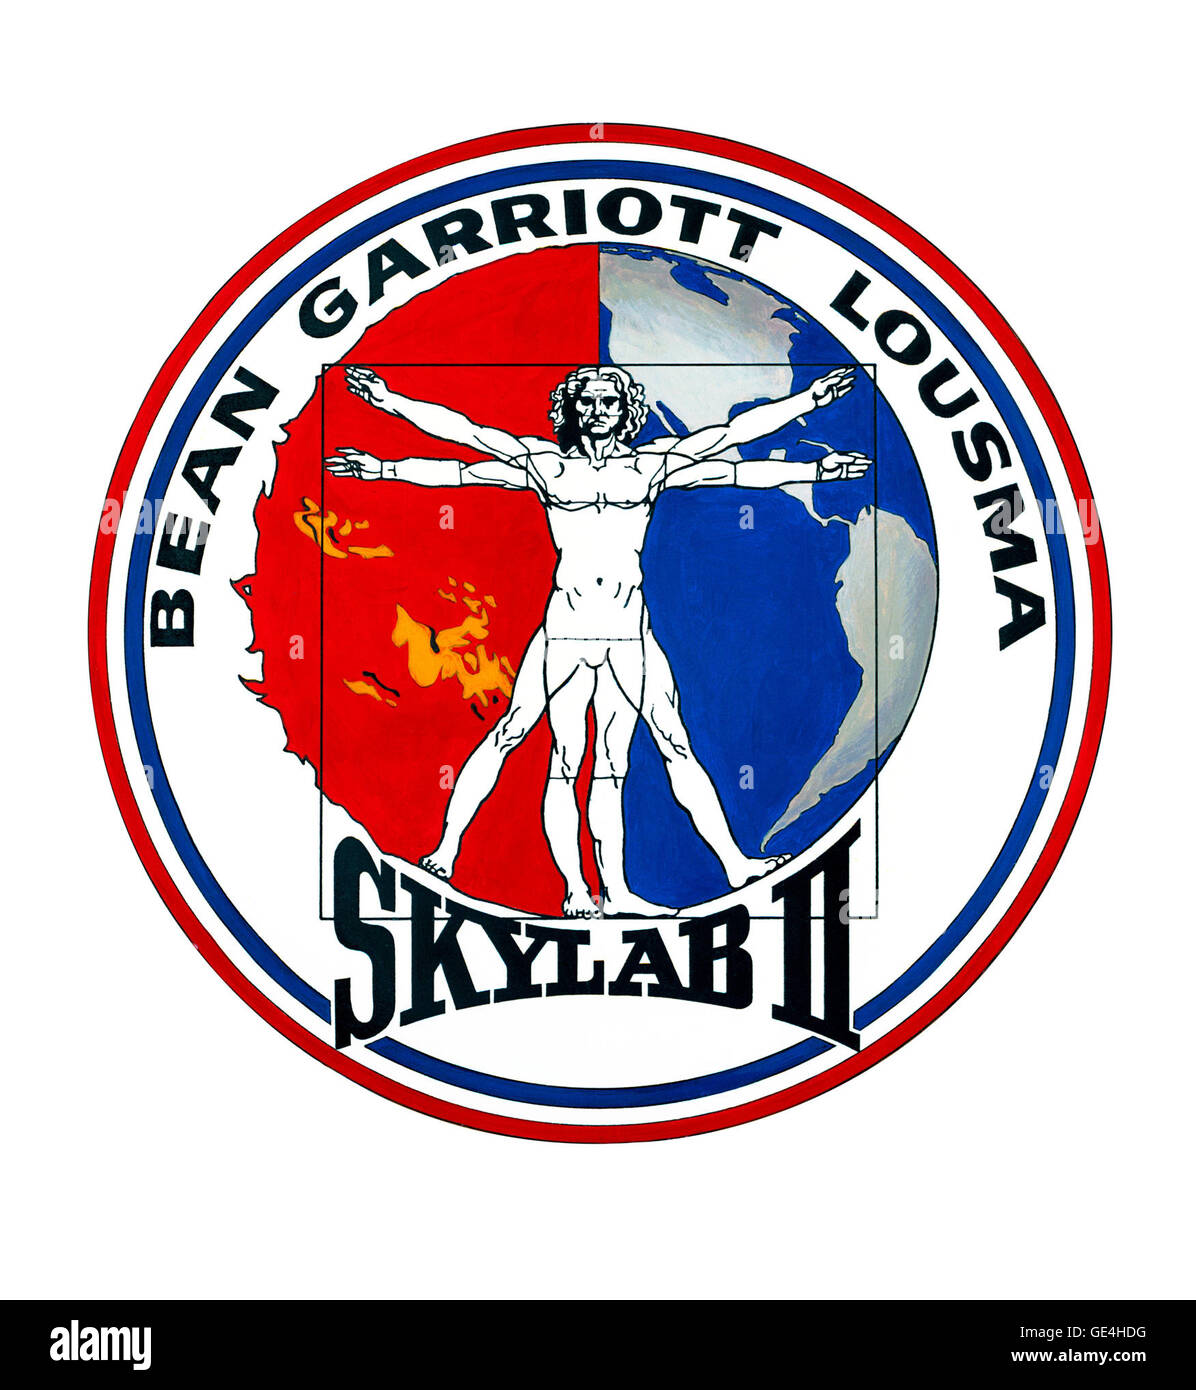 Launch- July 28, 1973  Landing- September 25, 1973 Astronauts: Alan L. Bean, Jack R. Lousma, and Owen K. Garriott Stock Photo